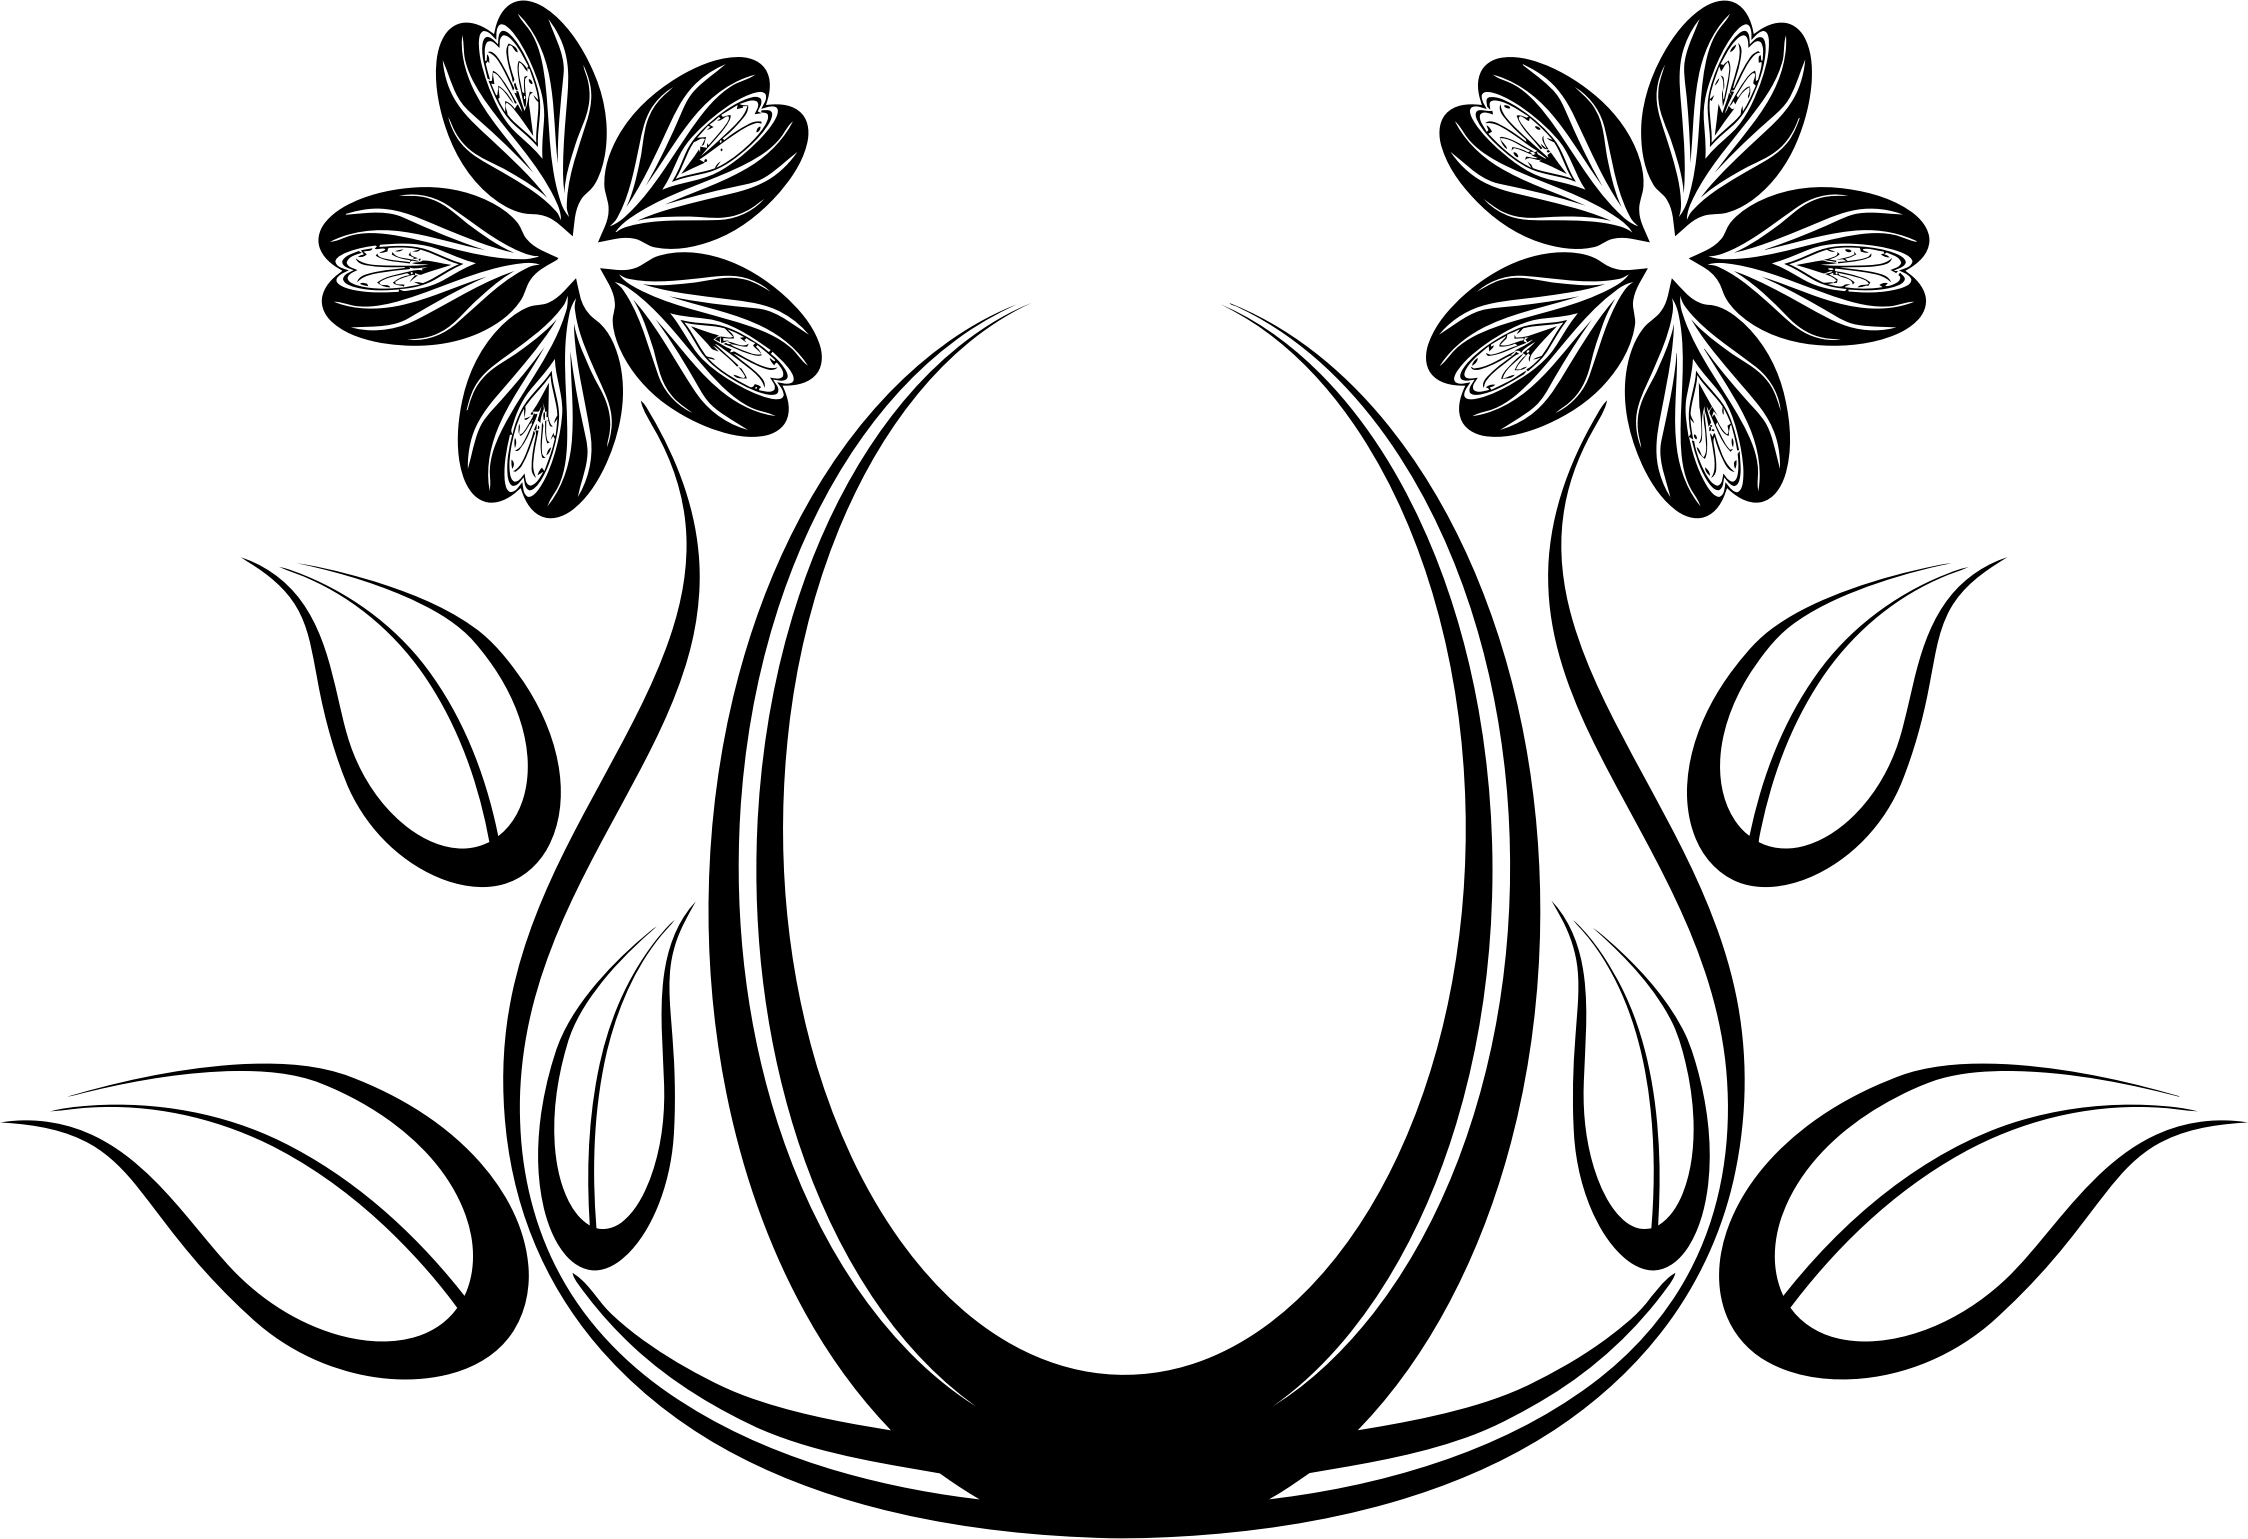 2248x1539 Black Rose Silhouette Design Free Clip Art Flower ~ Voilliov